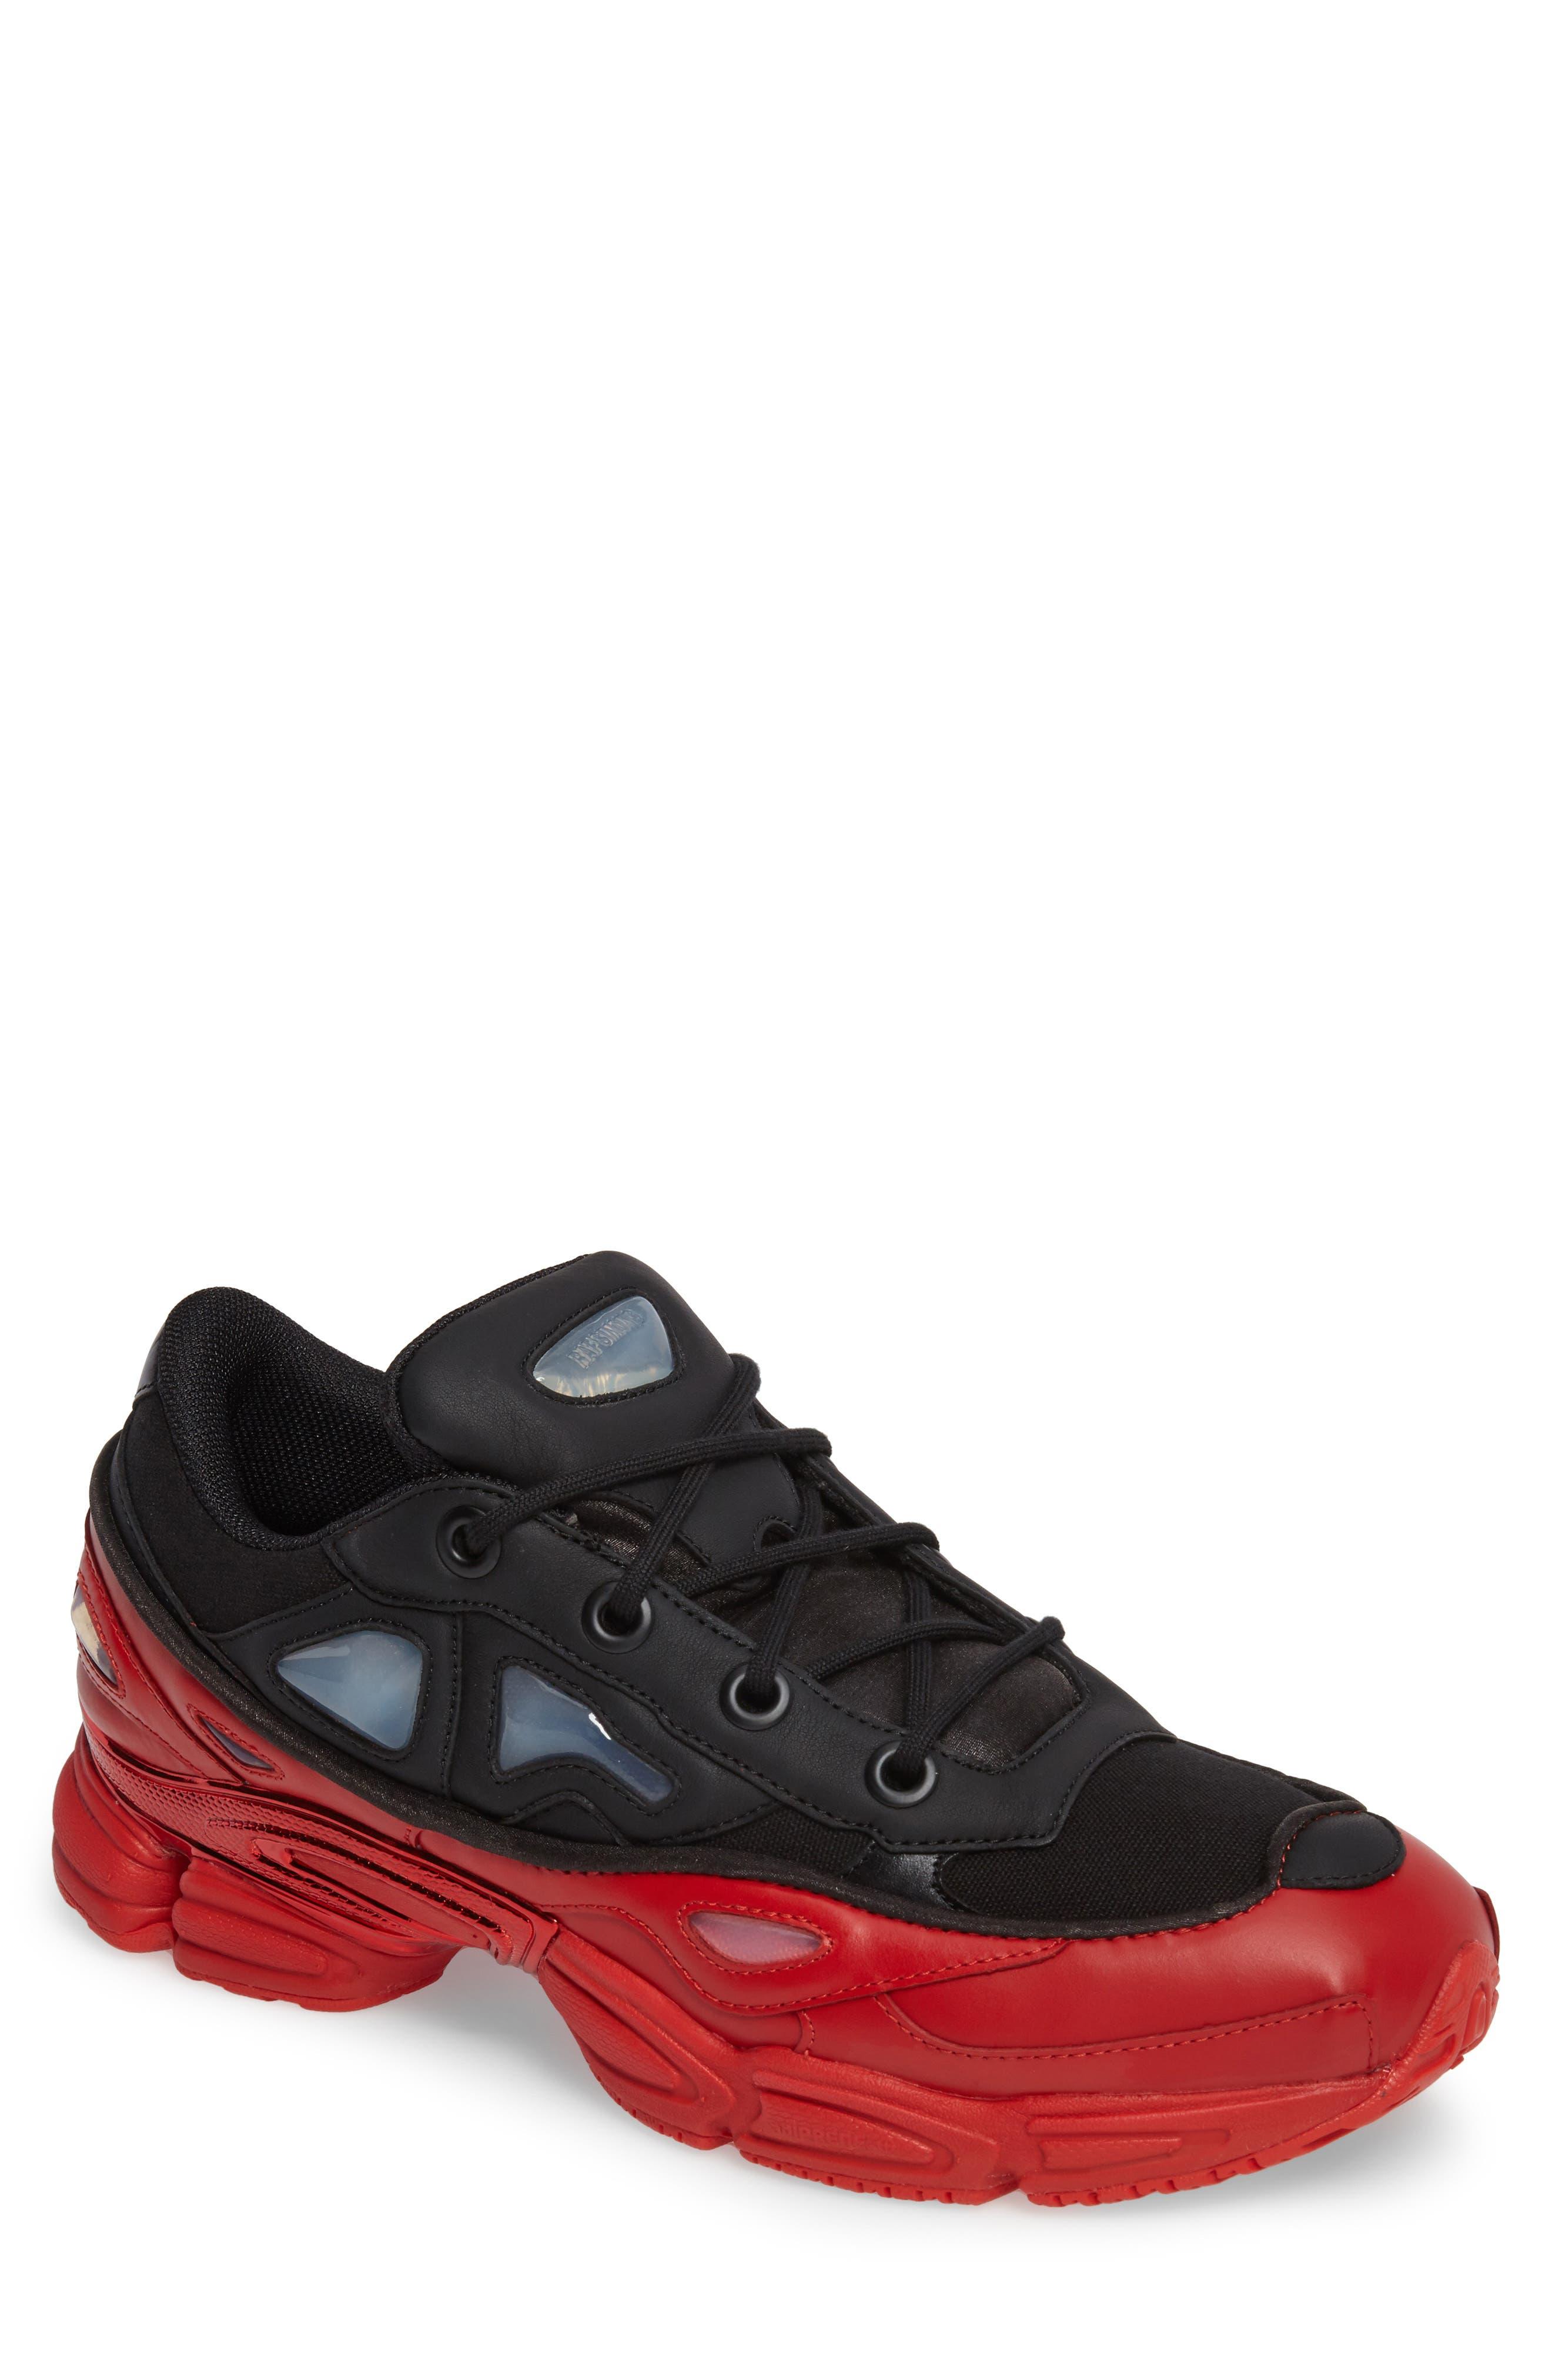 adidas by Raf Simons Ozweego Bunny Sneaker (Men)